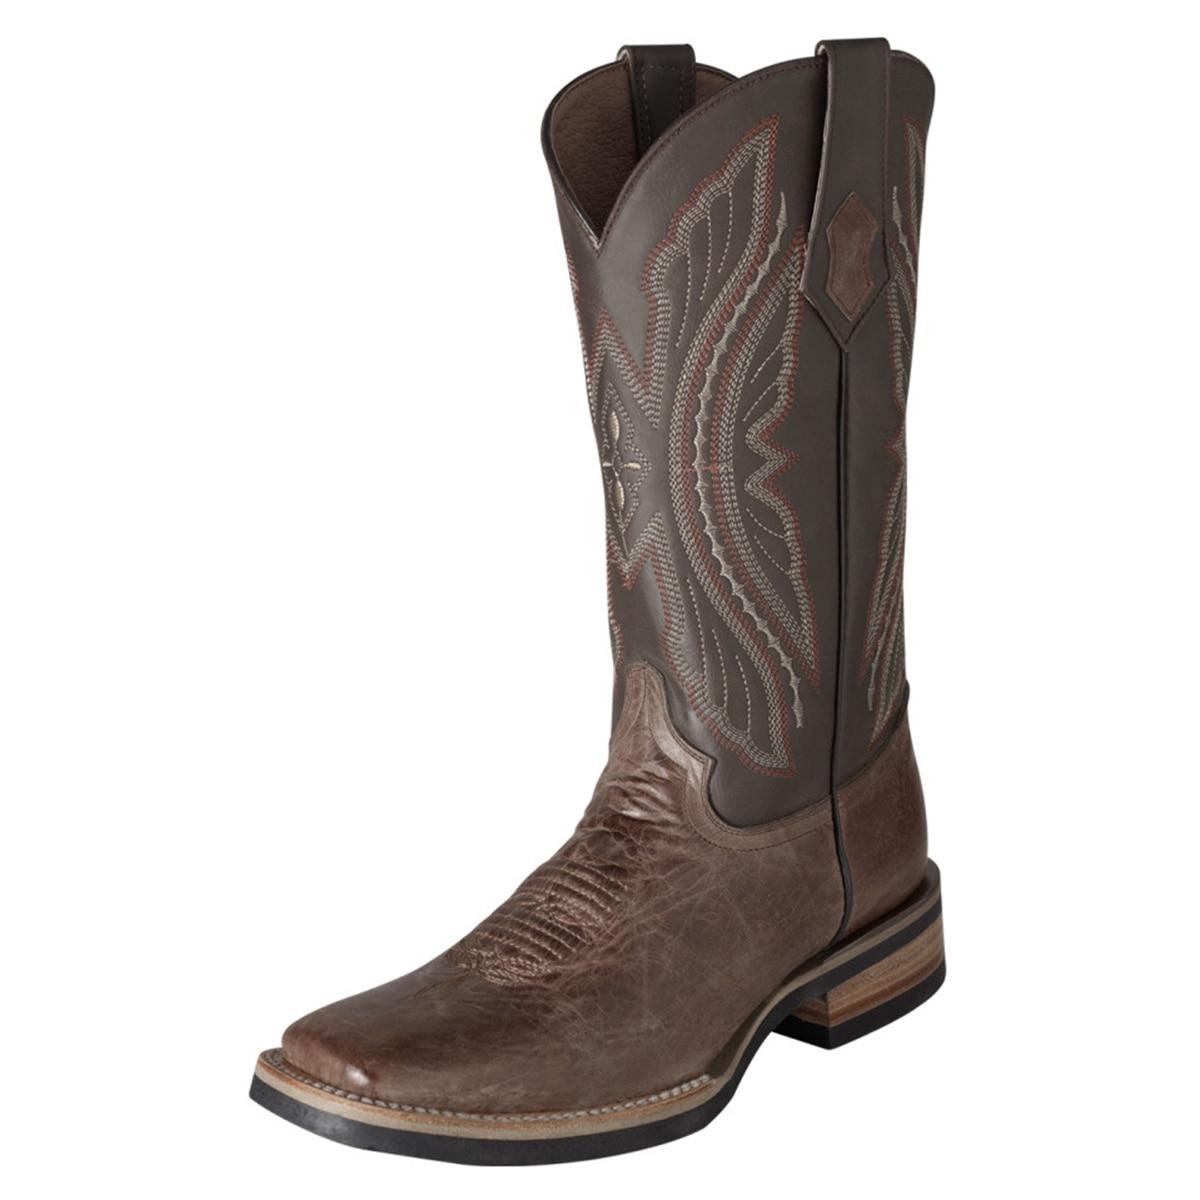 Ferrini Men's Kangaroo Boots